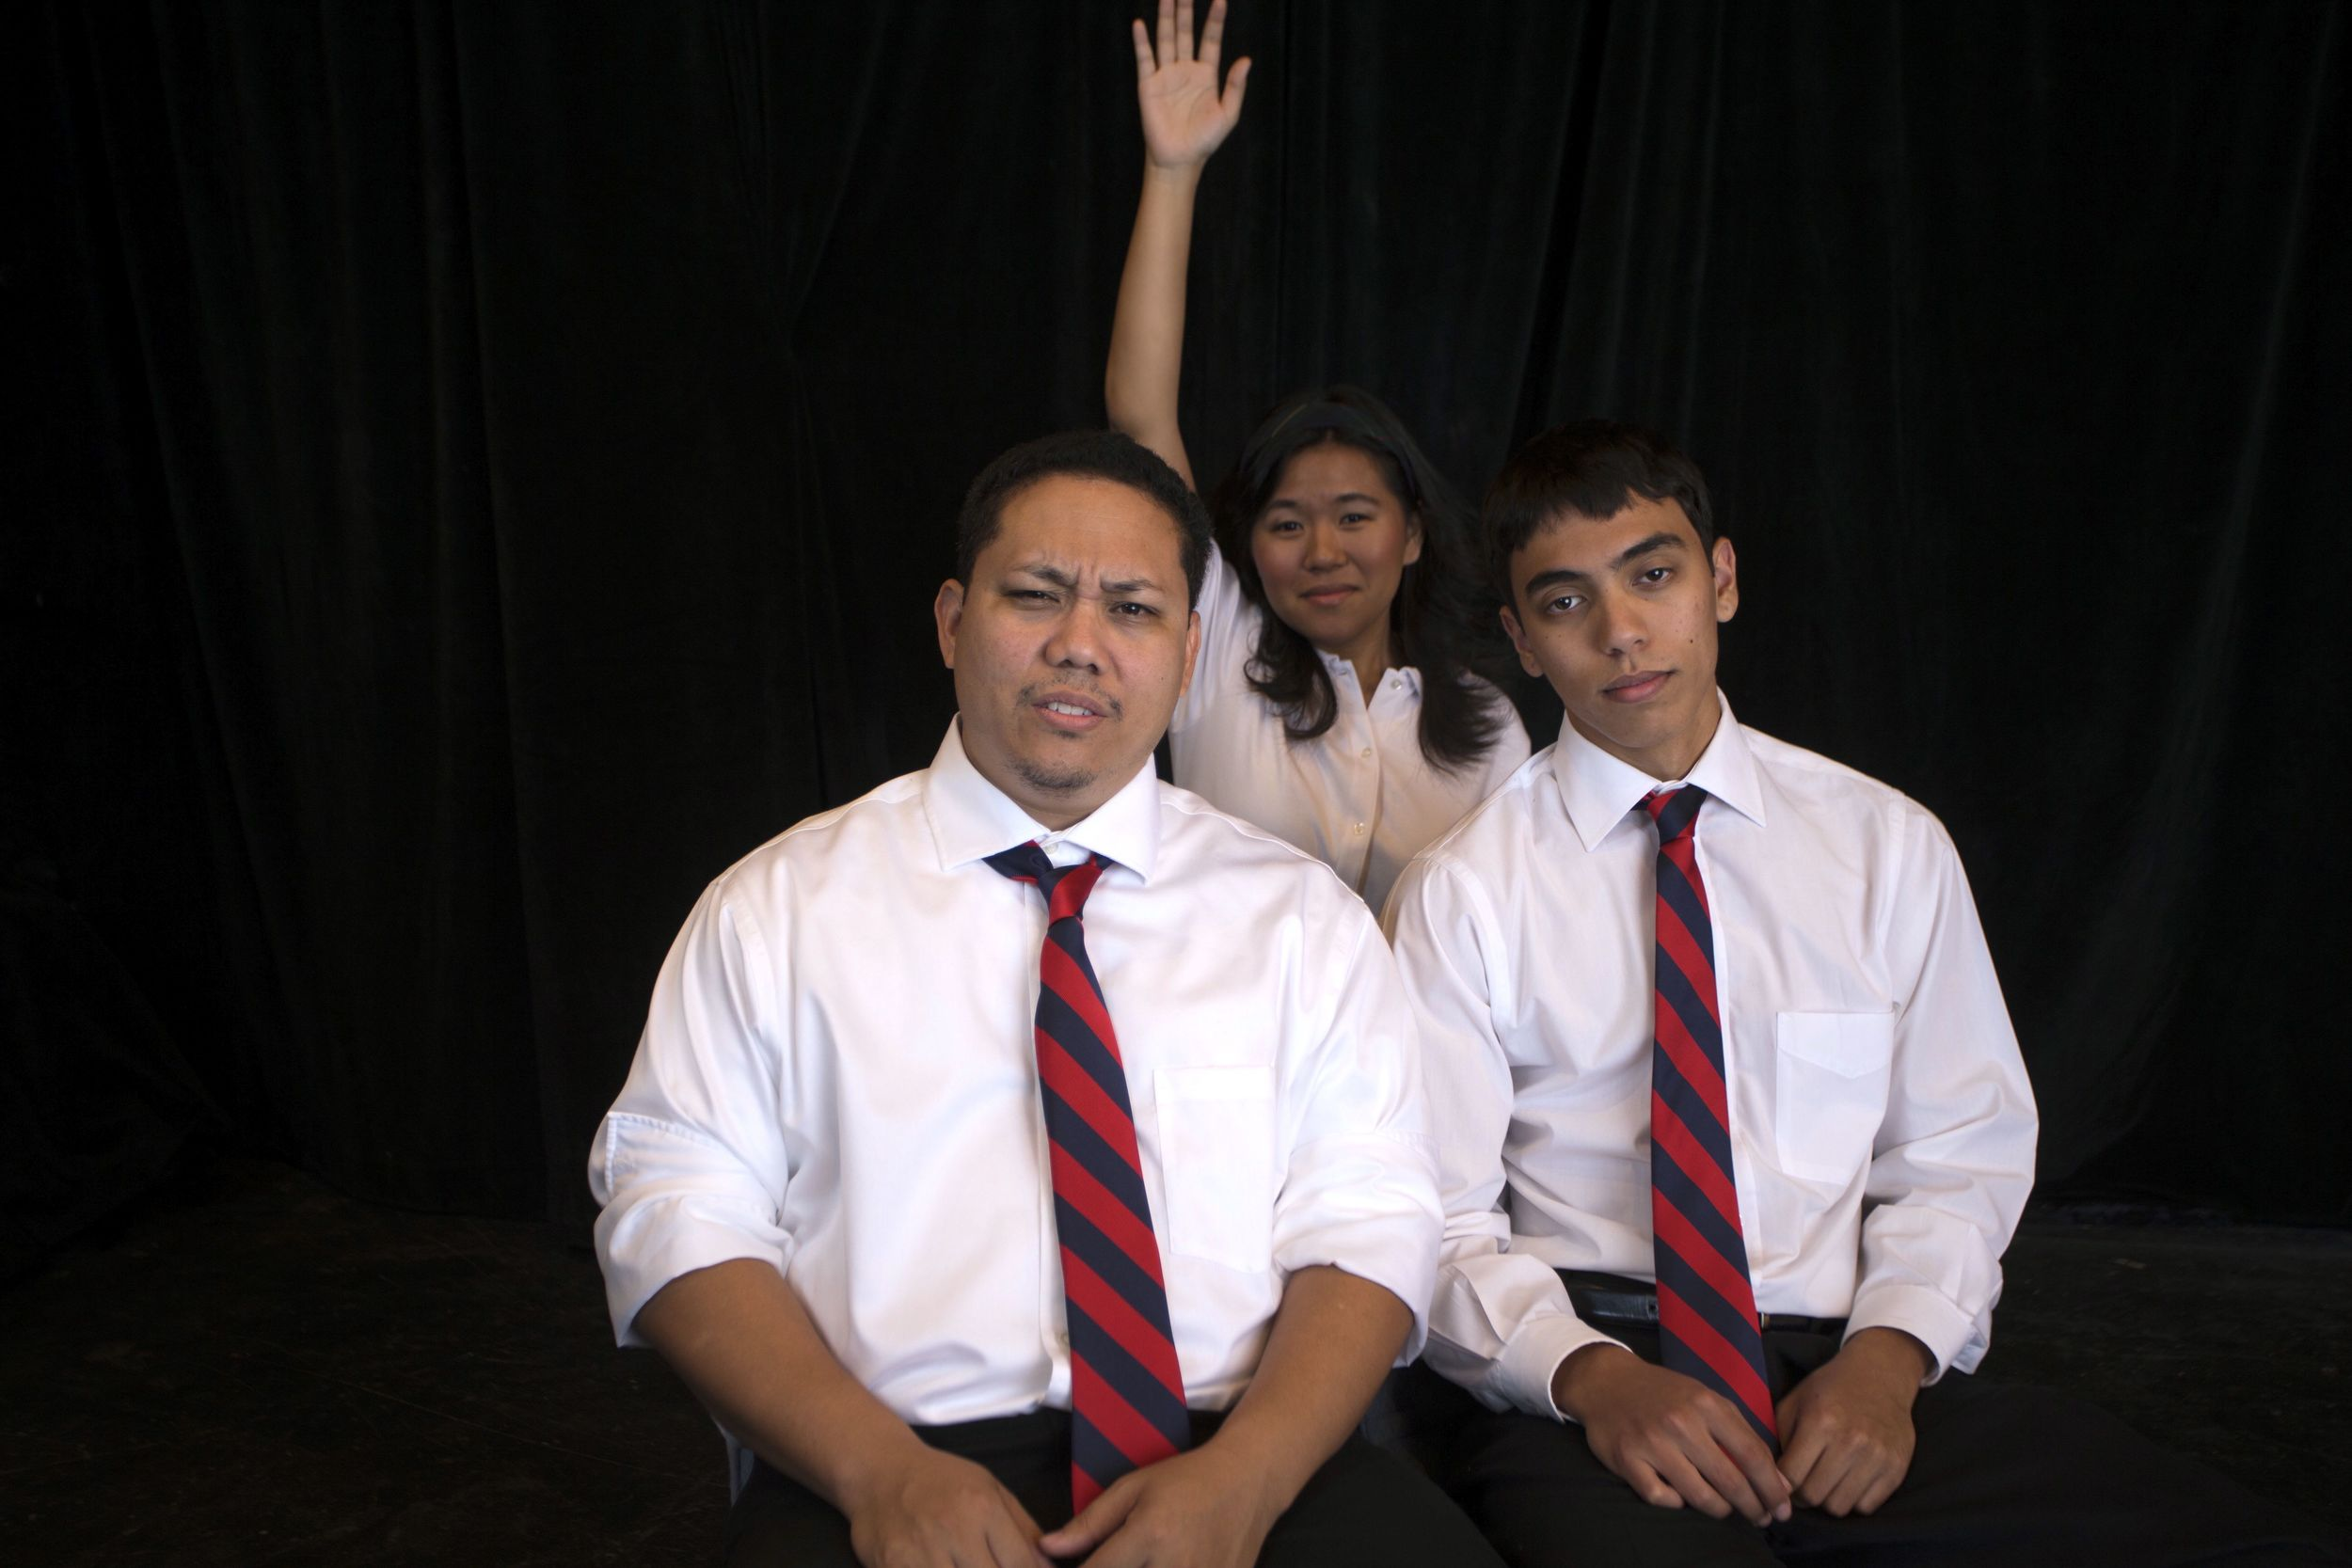 Kimo Albarado Bronte Amoy and Shawn Vasconcelles 4.jpg